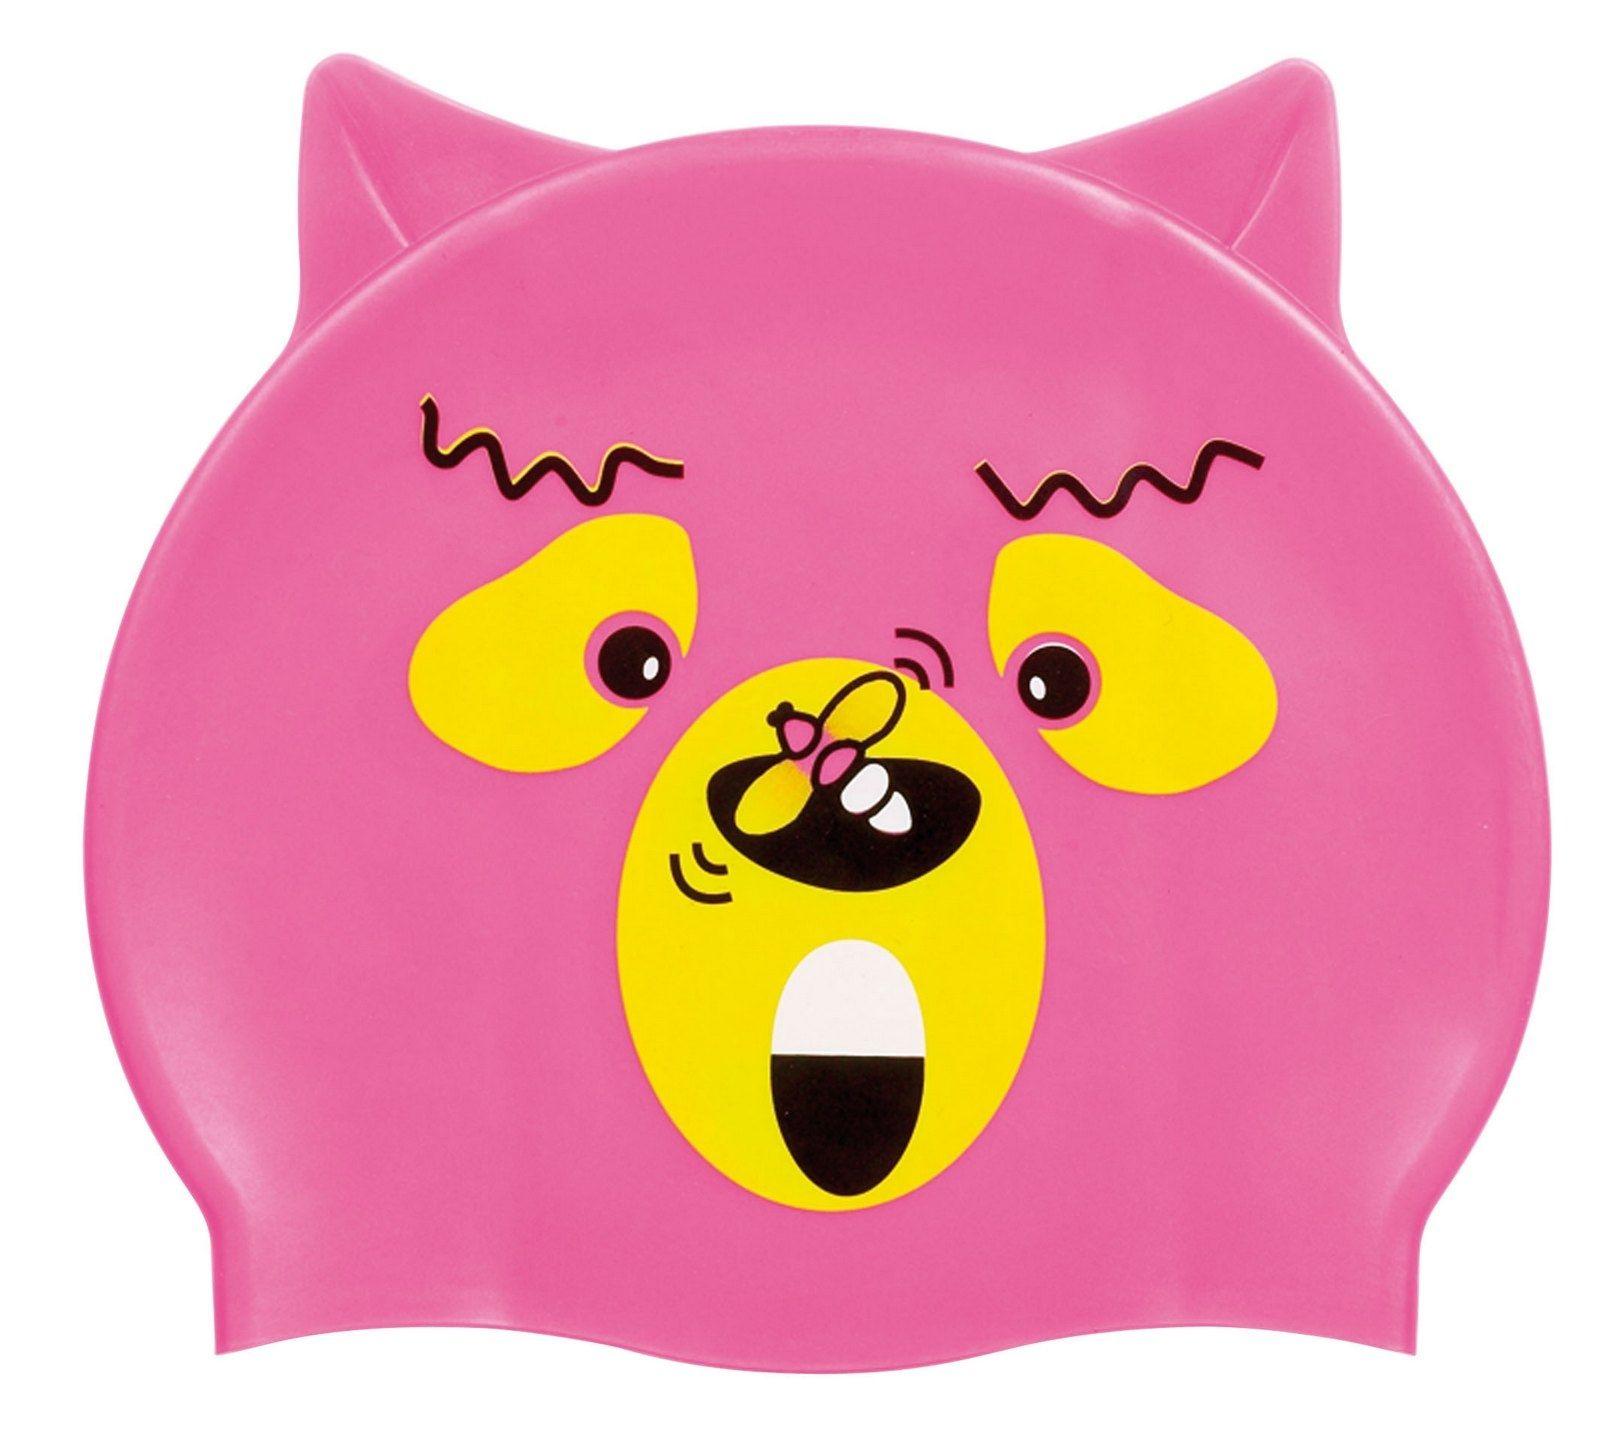 beco Beco 7394 шапочка для плавания детская pink with orange bear